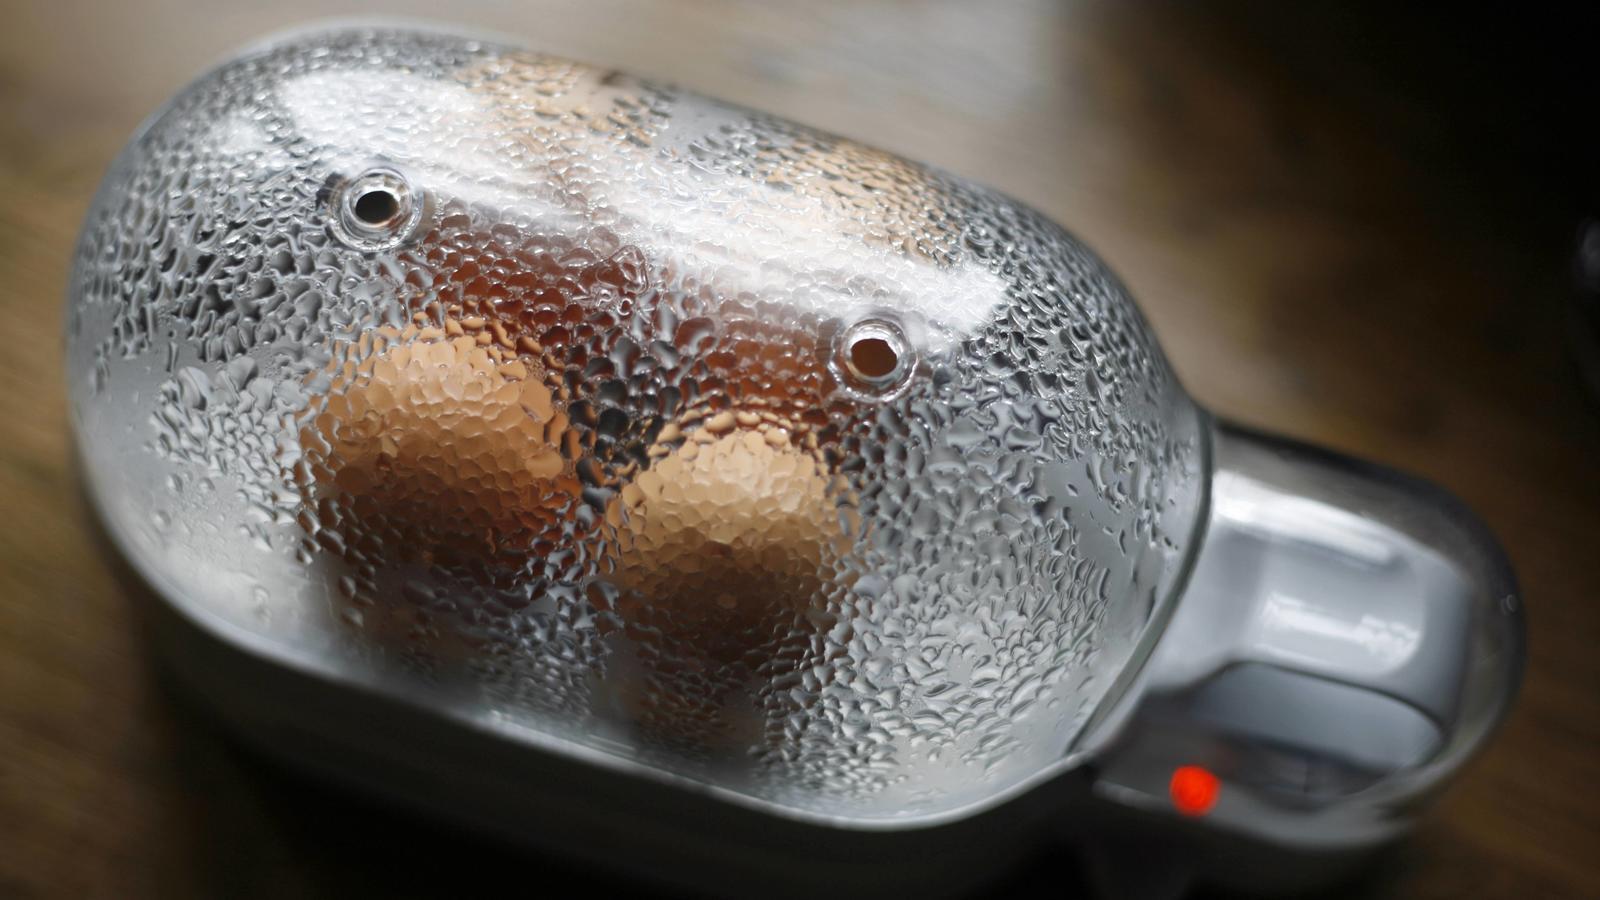 Mit Dem Eierkocher Endlich Perfekte Frühstückseier Kochen Kochbarde